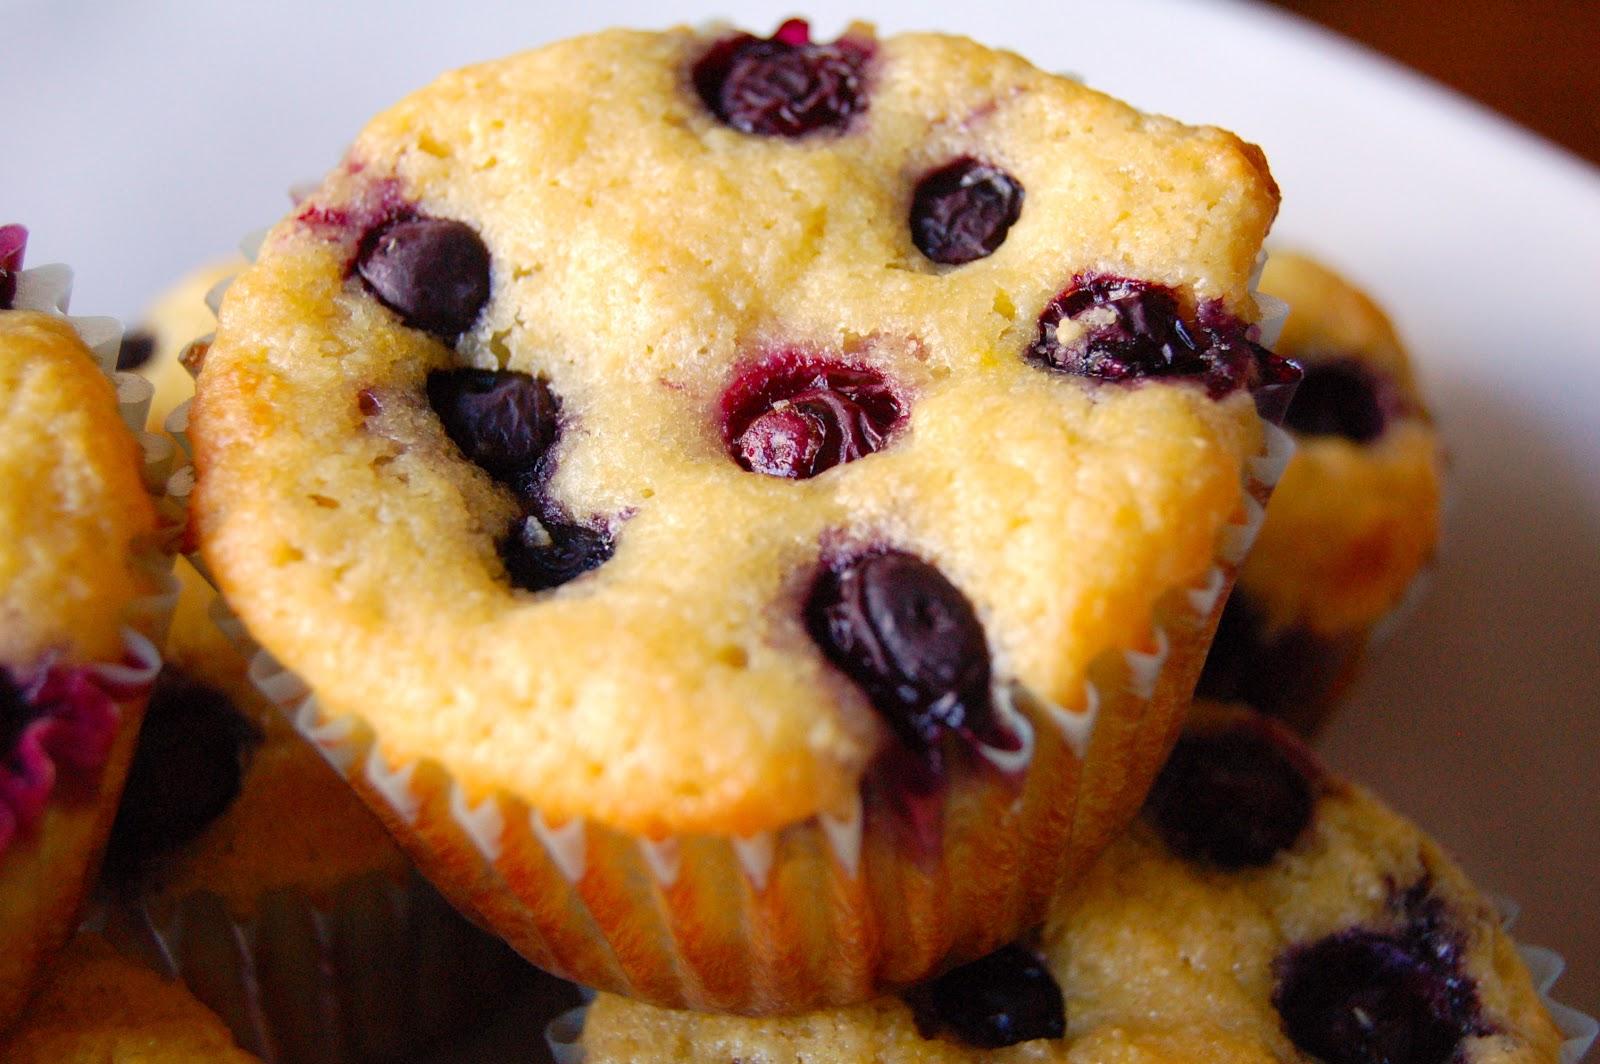 Lemon Blueberry Muffins (Gluten Free) | www.kettlercuisine.com